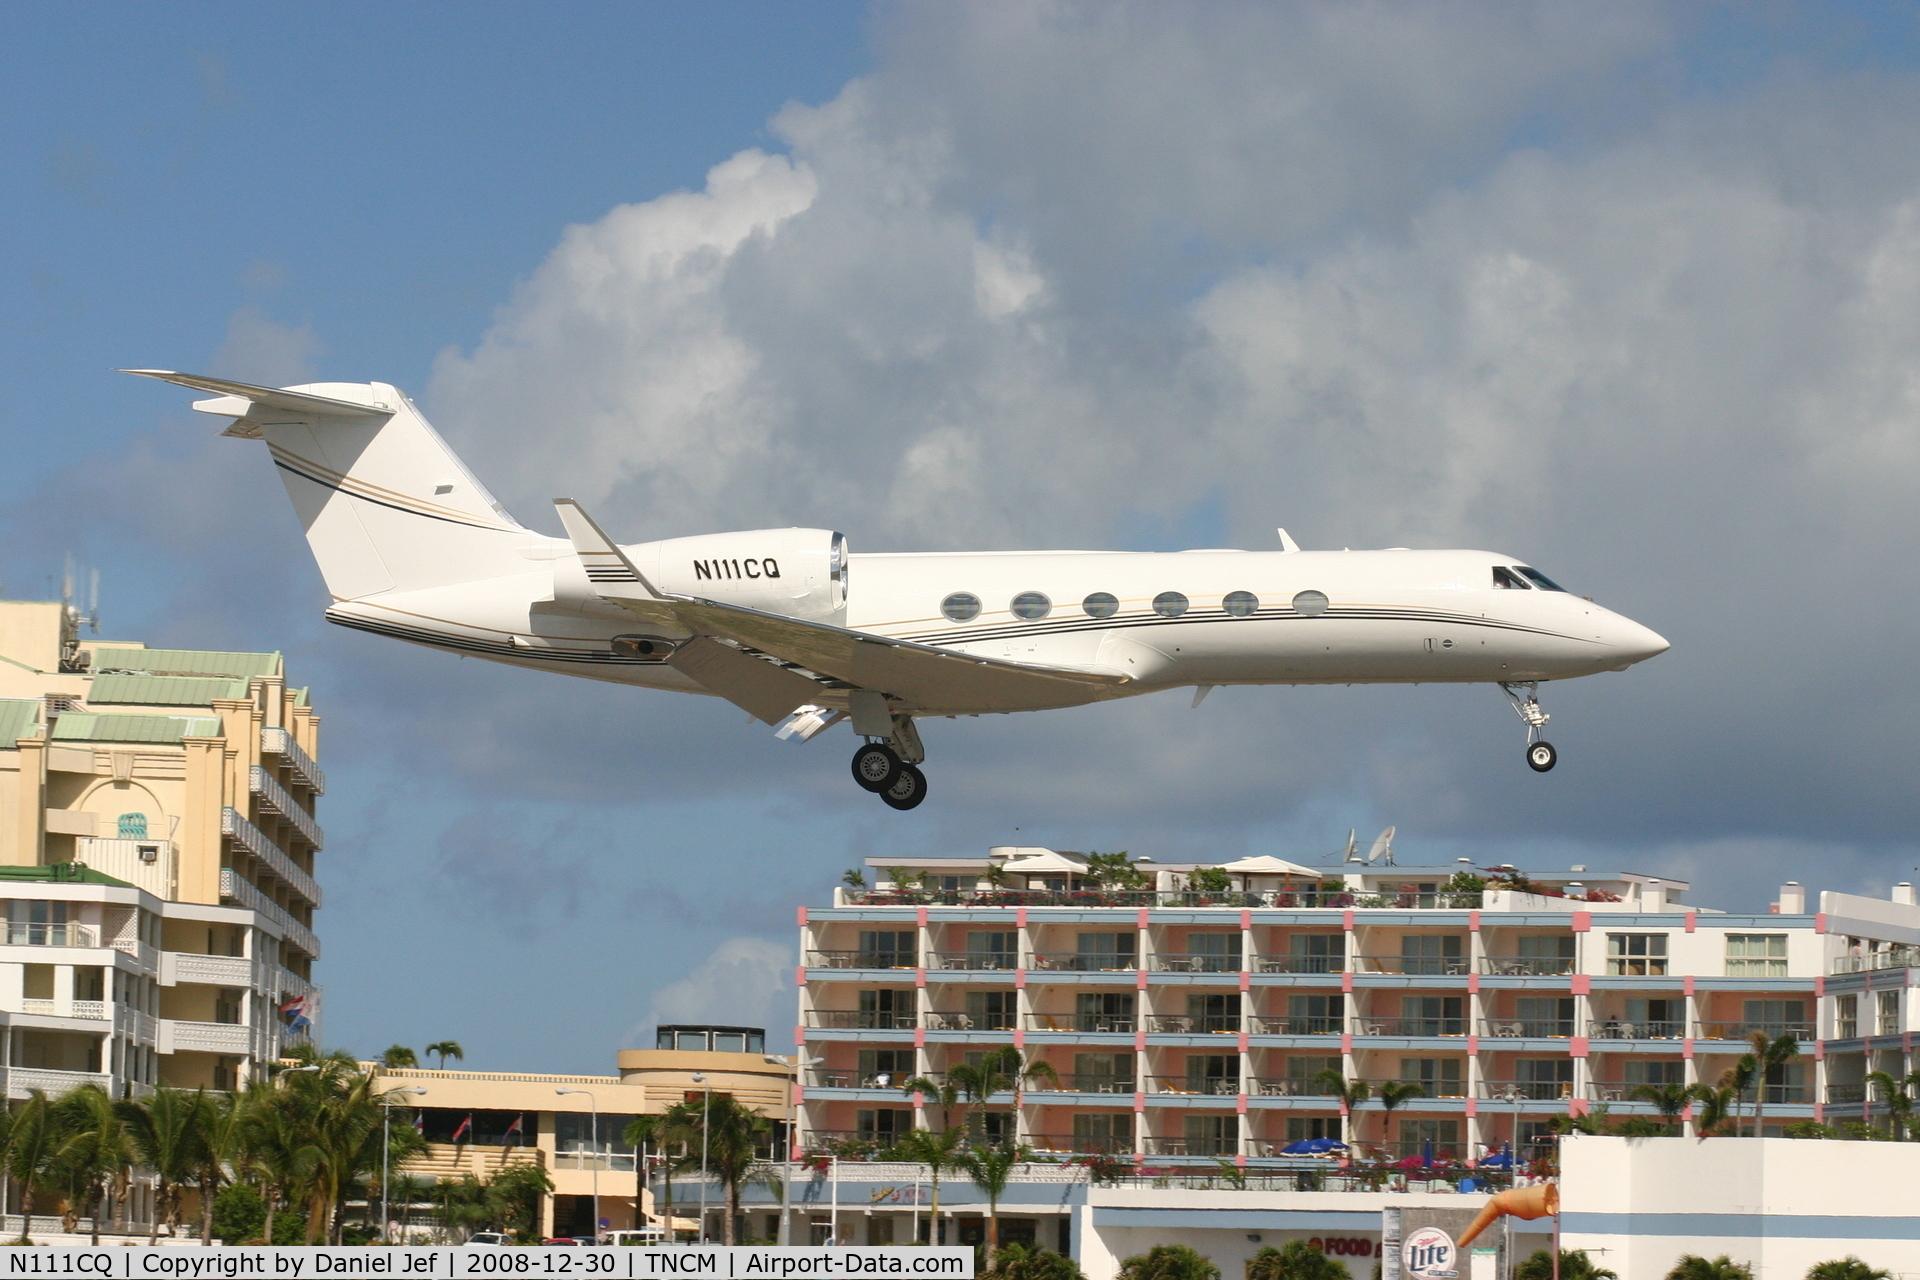 N111CQ, 2004 Gulfstream Aerospace GIV-X (G450) C/N 4006, N111CQ landing at TNCM runway 10